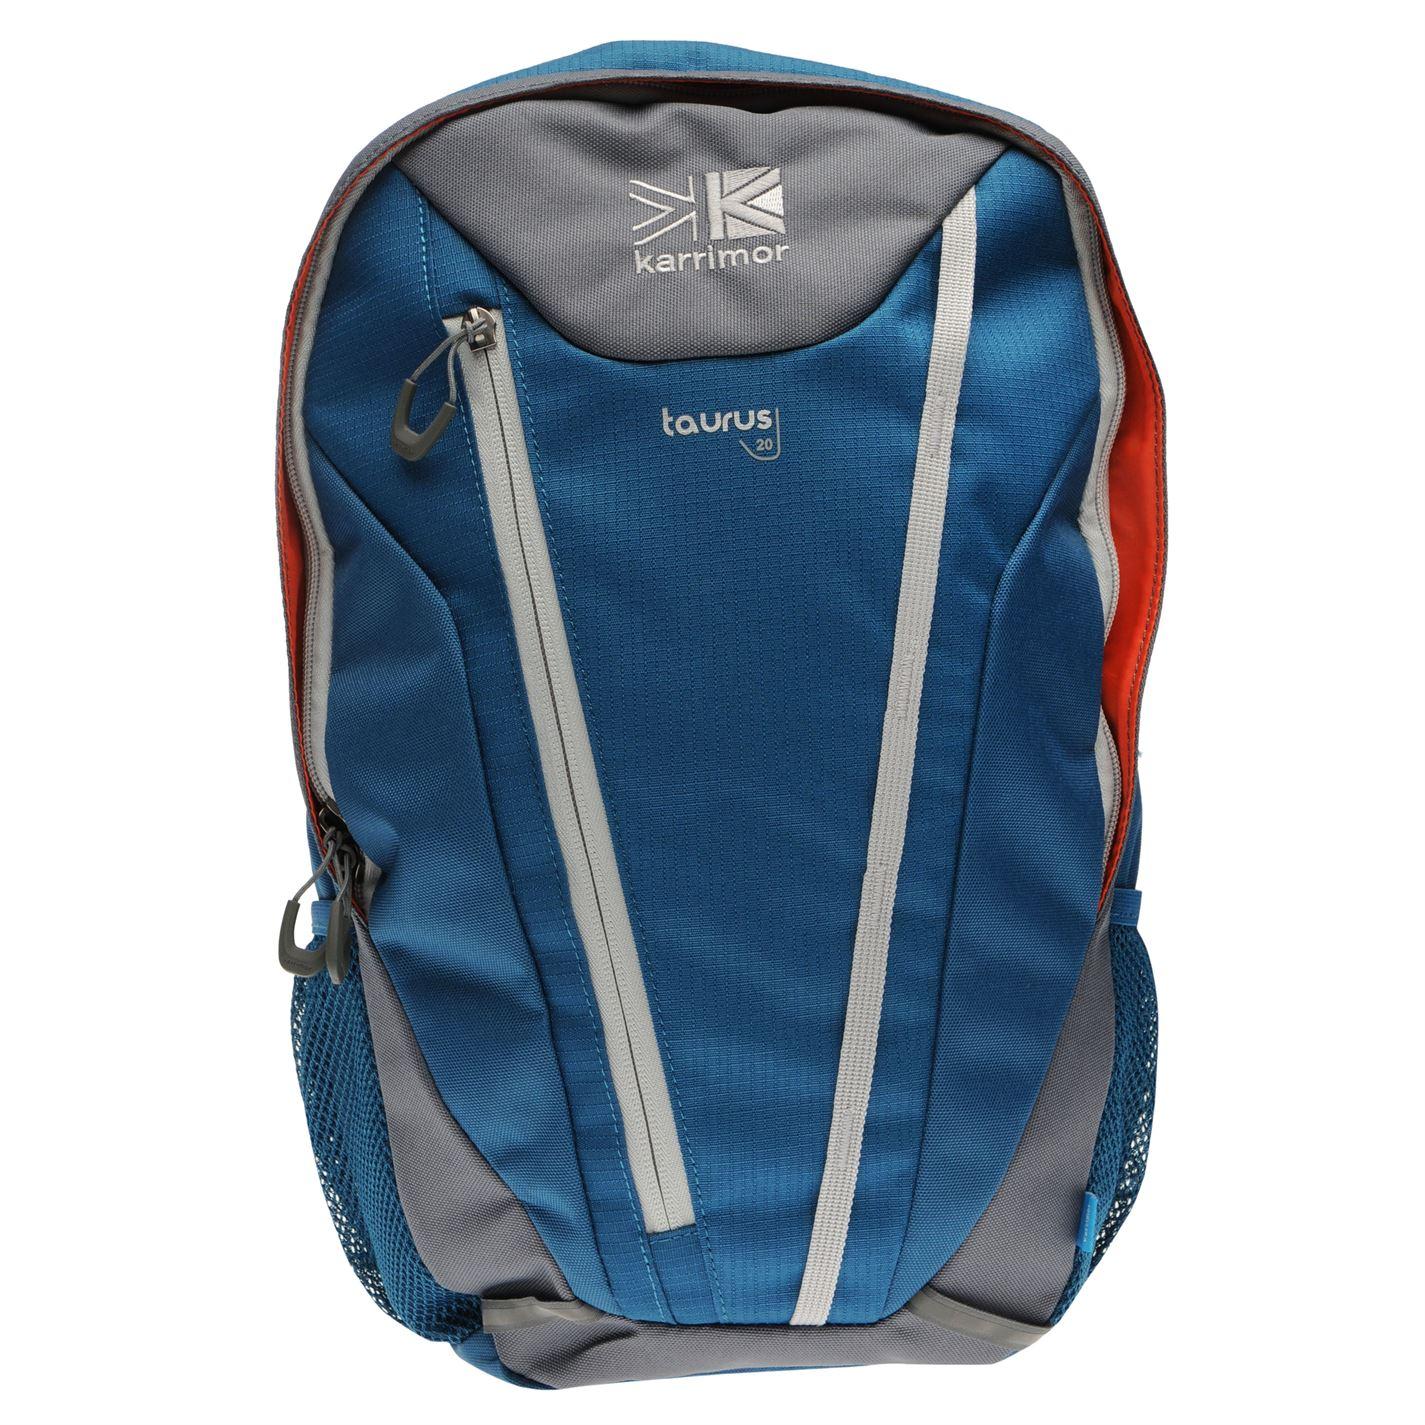 Karrimor Taurus 20 sac à dos Sac à dos Sac Bagages personnels Carry Sack